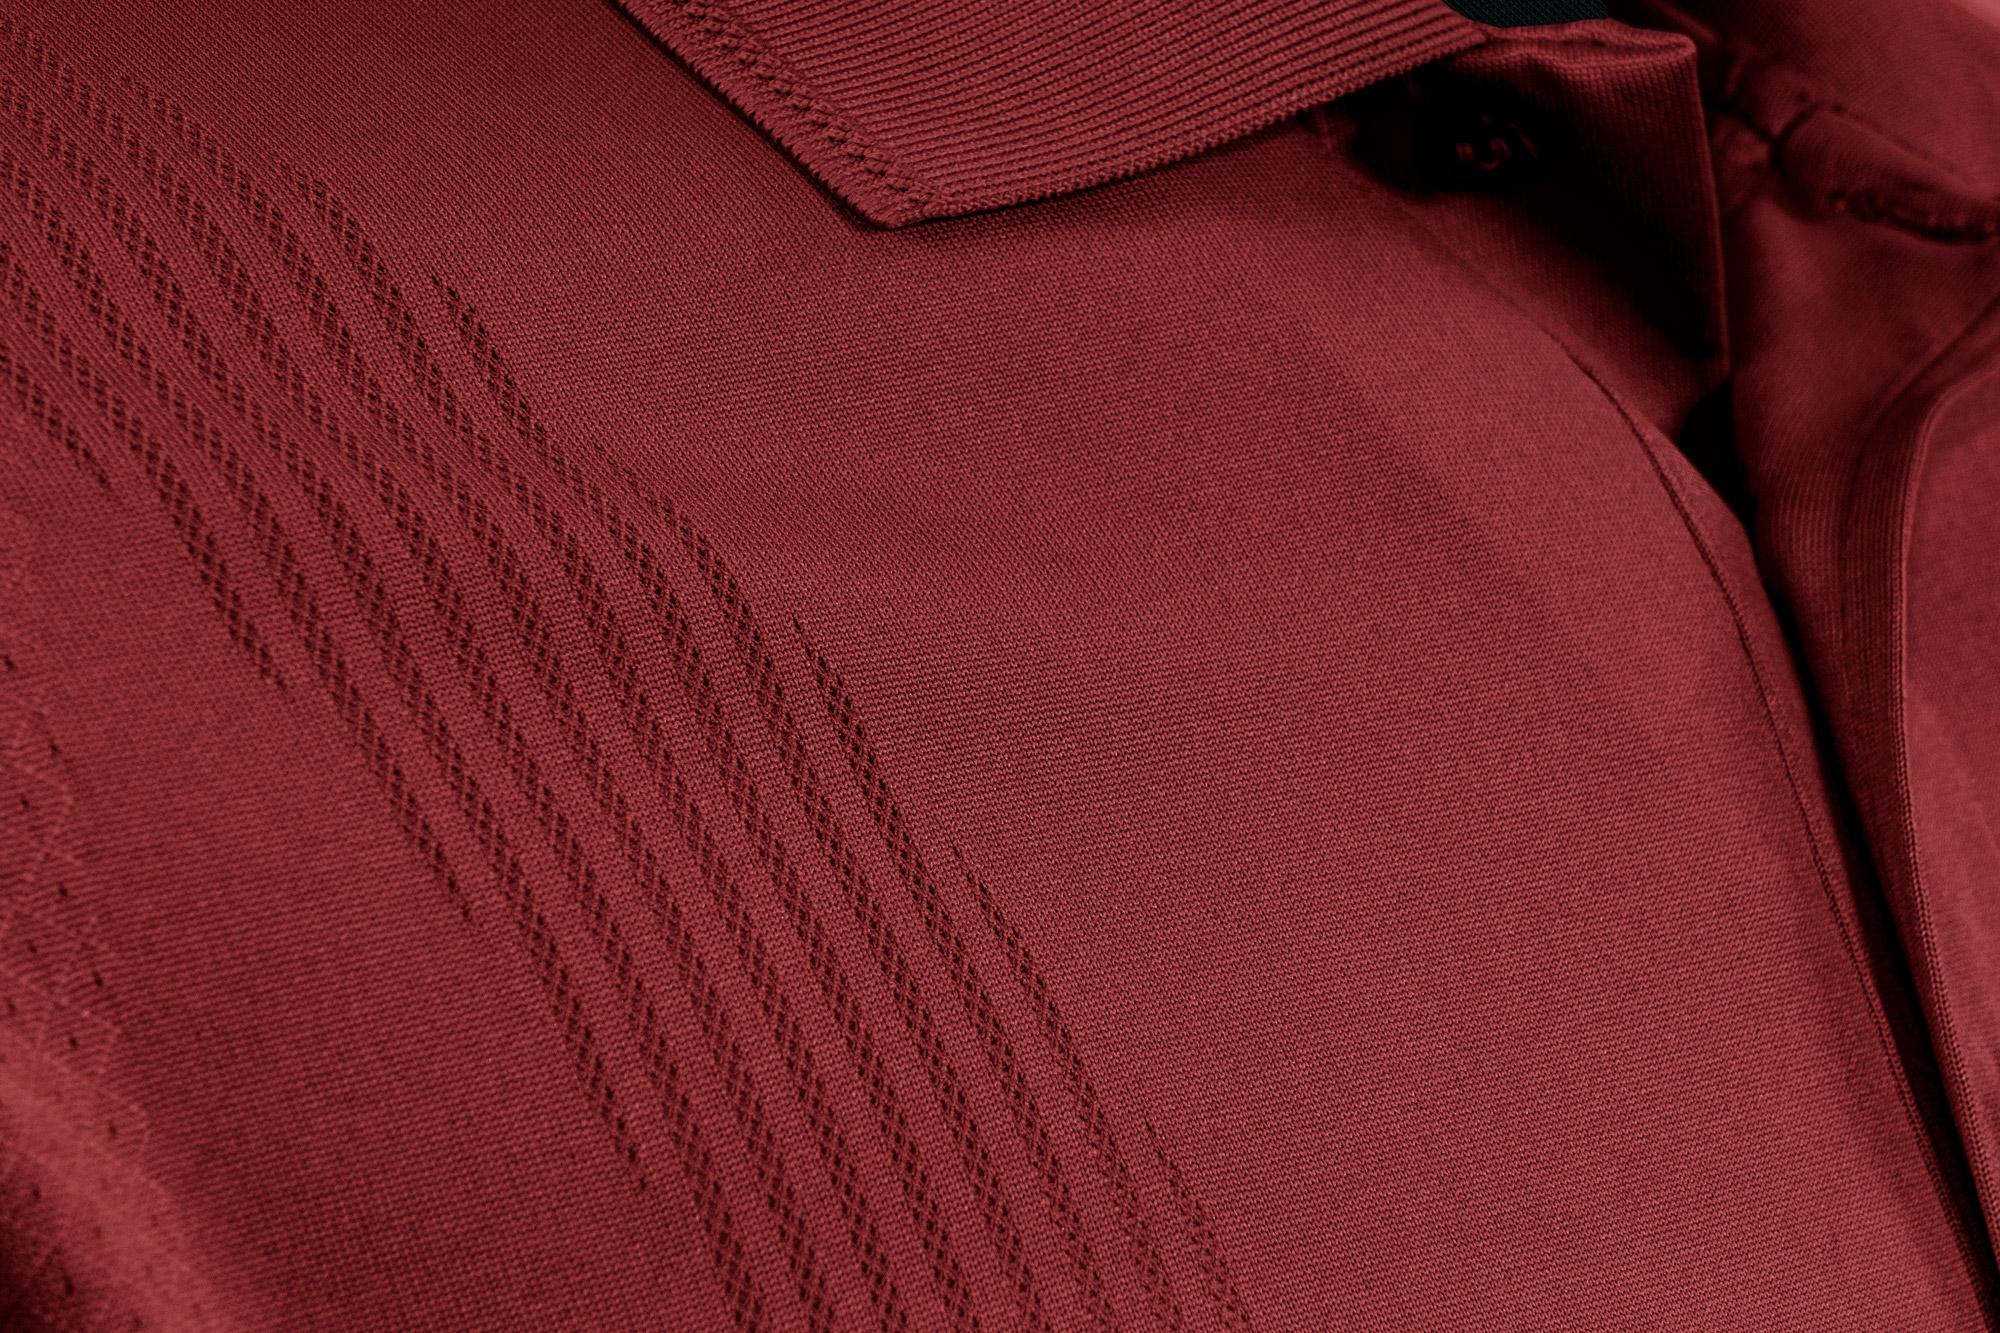 bodymapping polo shirt closeup